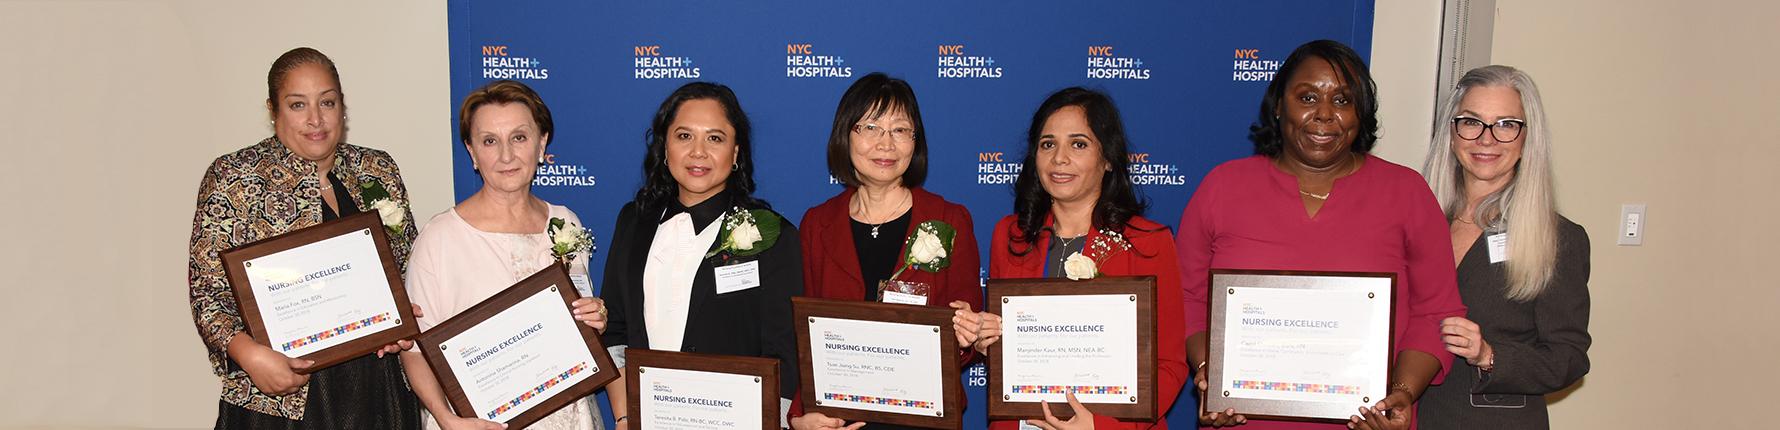 Nursing Excellence Awards